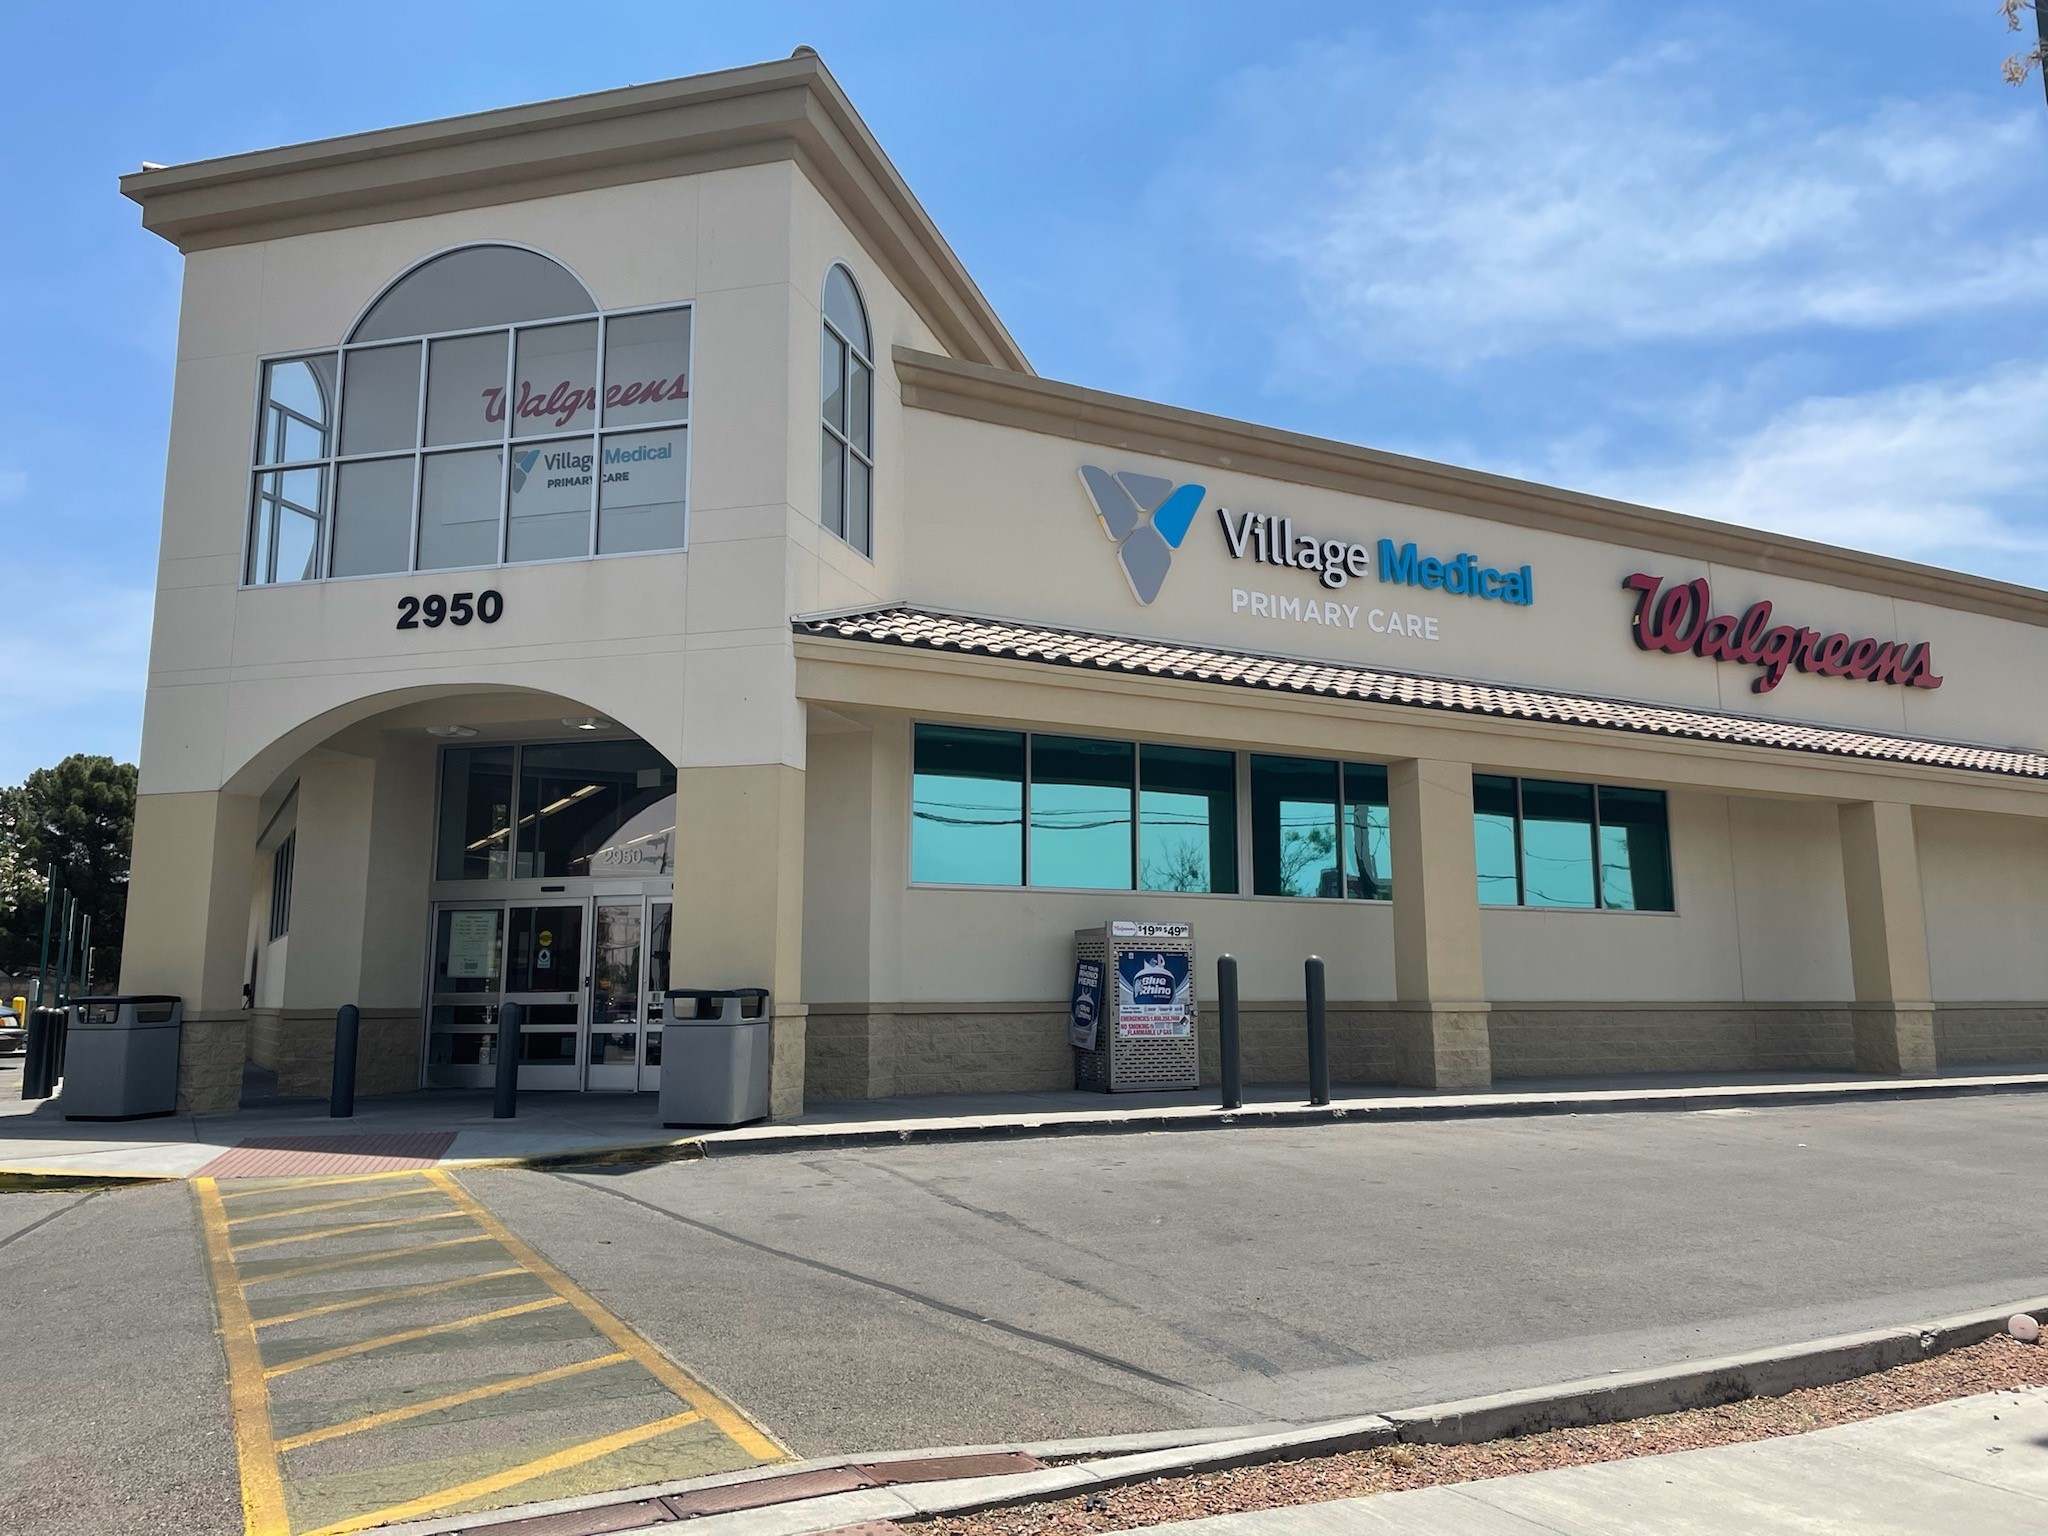 Village Medical at Walgreens - 2950 George Dieter Dr  El Paso, TX 79936